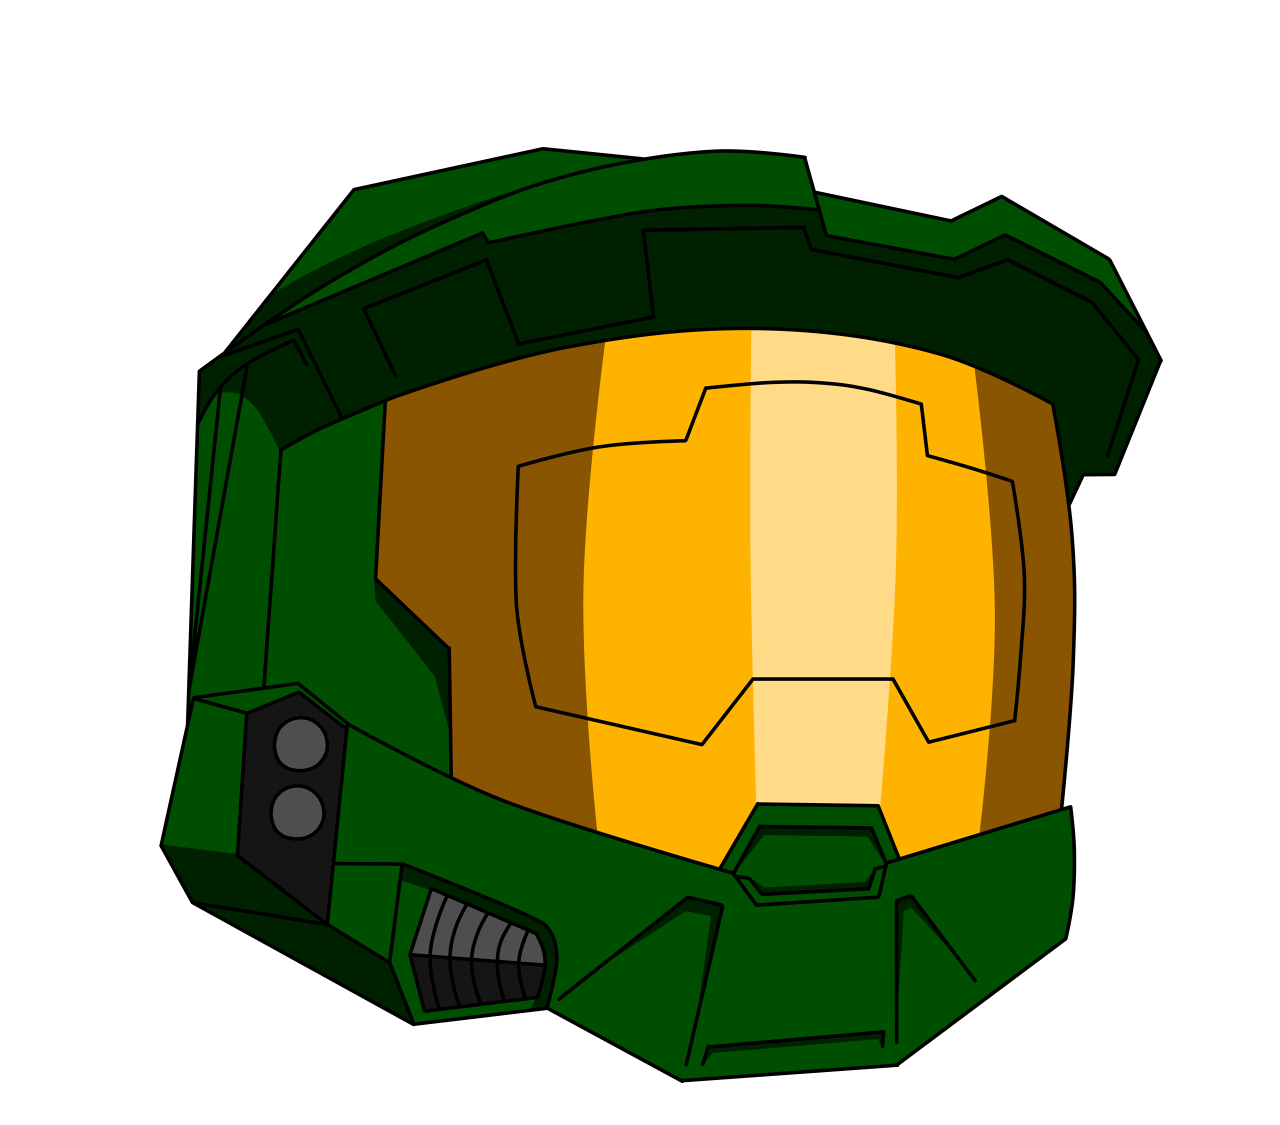 Master chief helmet png. Yukkuri wiki fandom powered